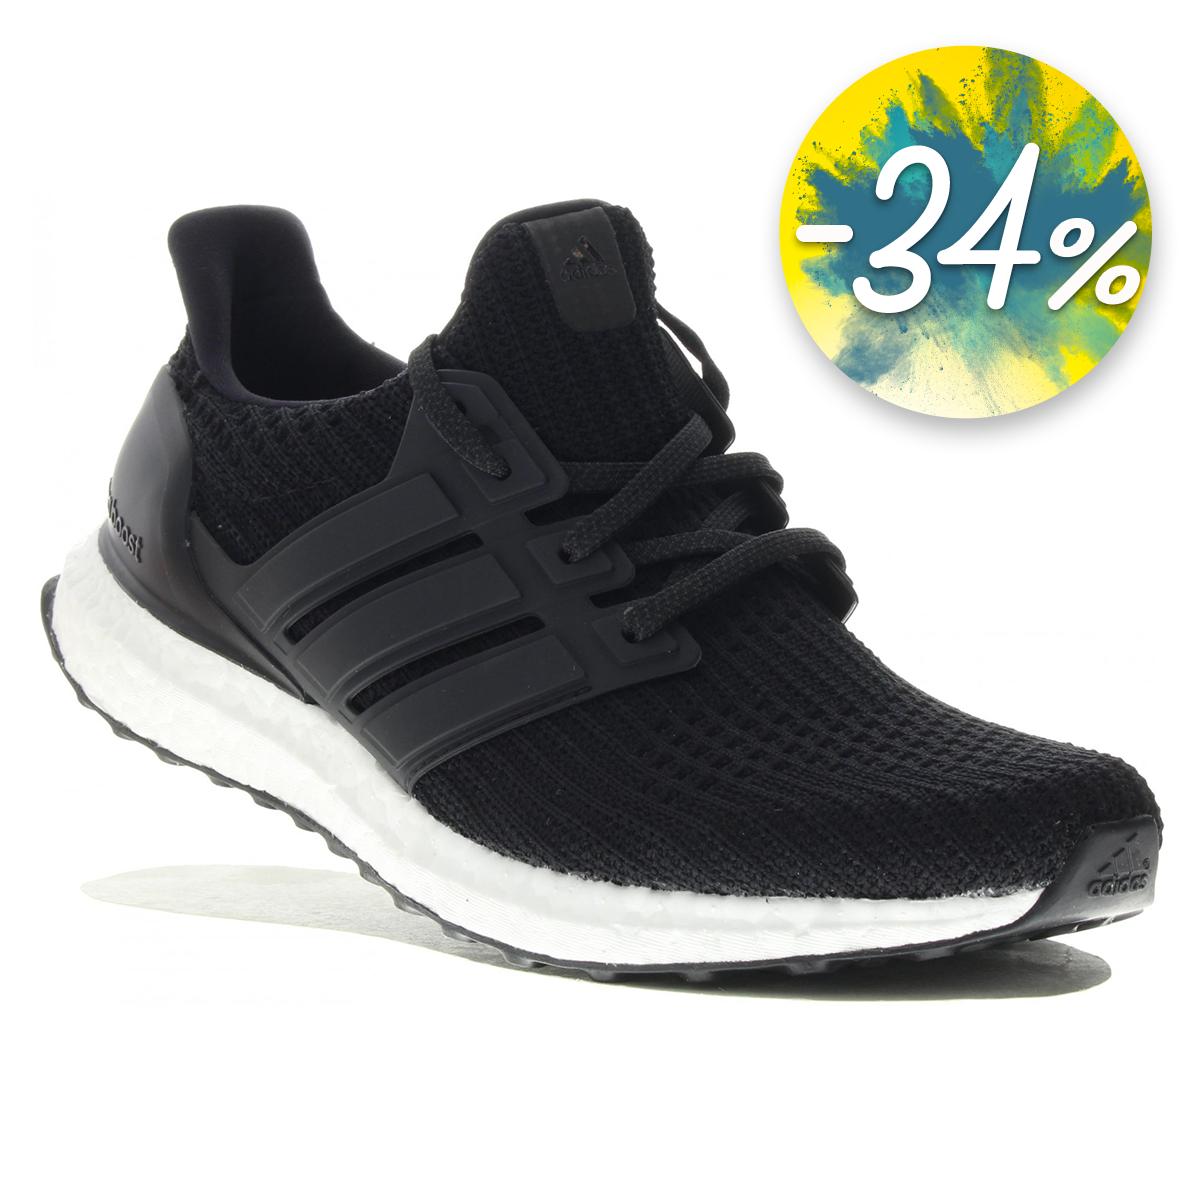 FR adidas ultraboost m chaussures homme 240288 1 fz 1200x1200